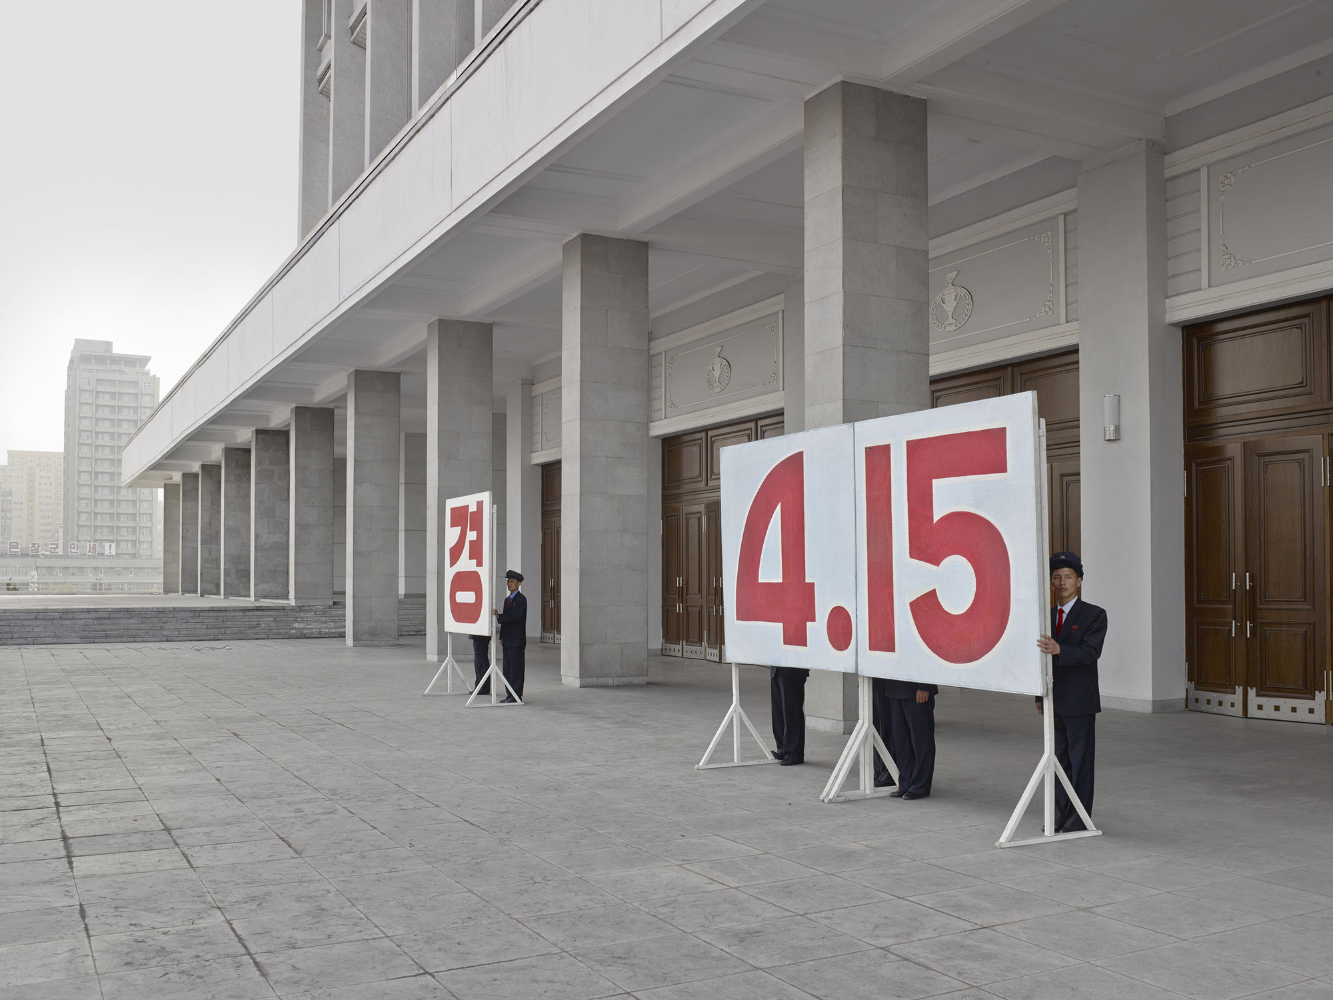 © Eddo Hartmann & Koryo Studio - Birthday of Kim Il Sung, 2014